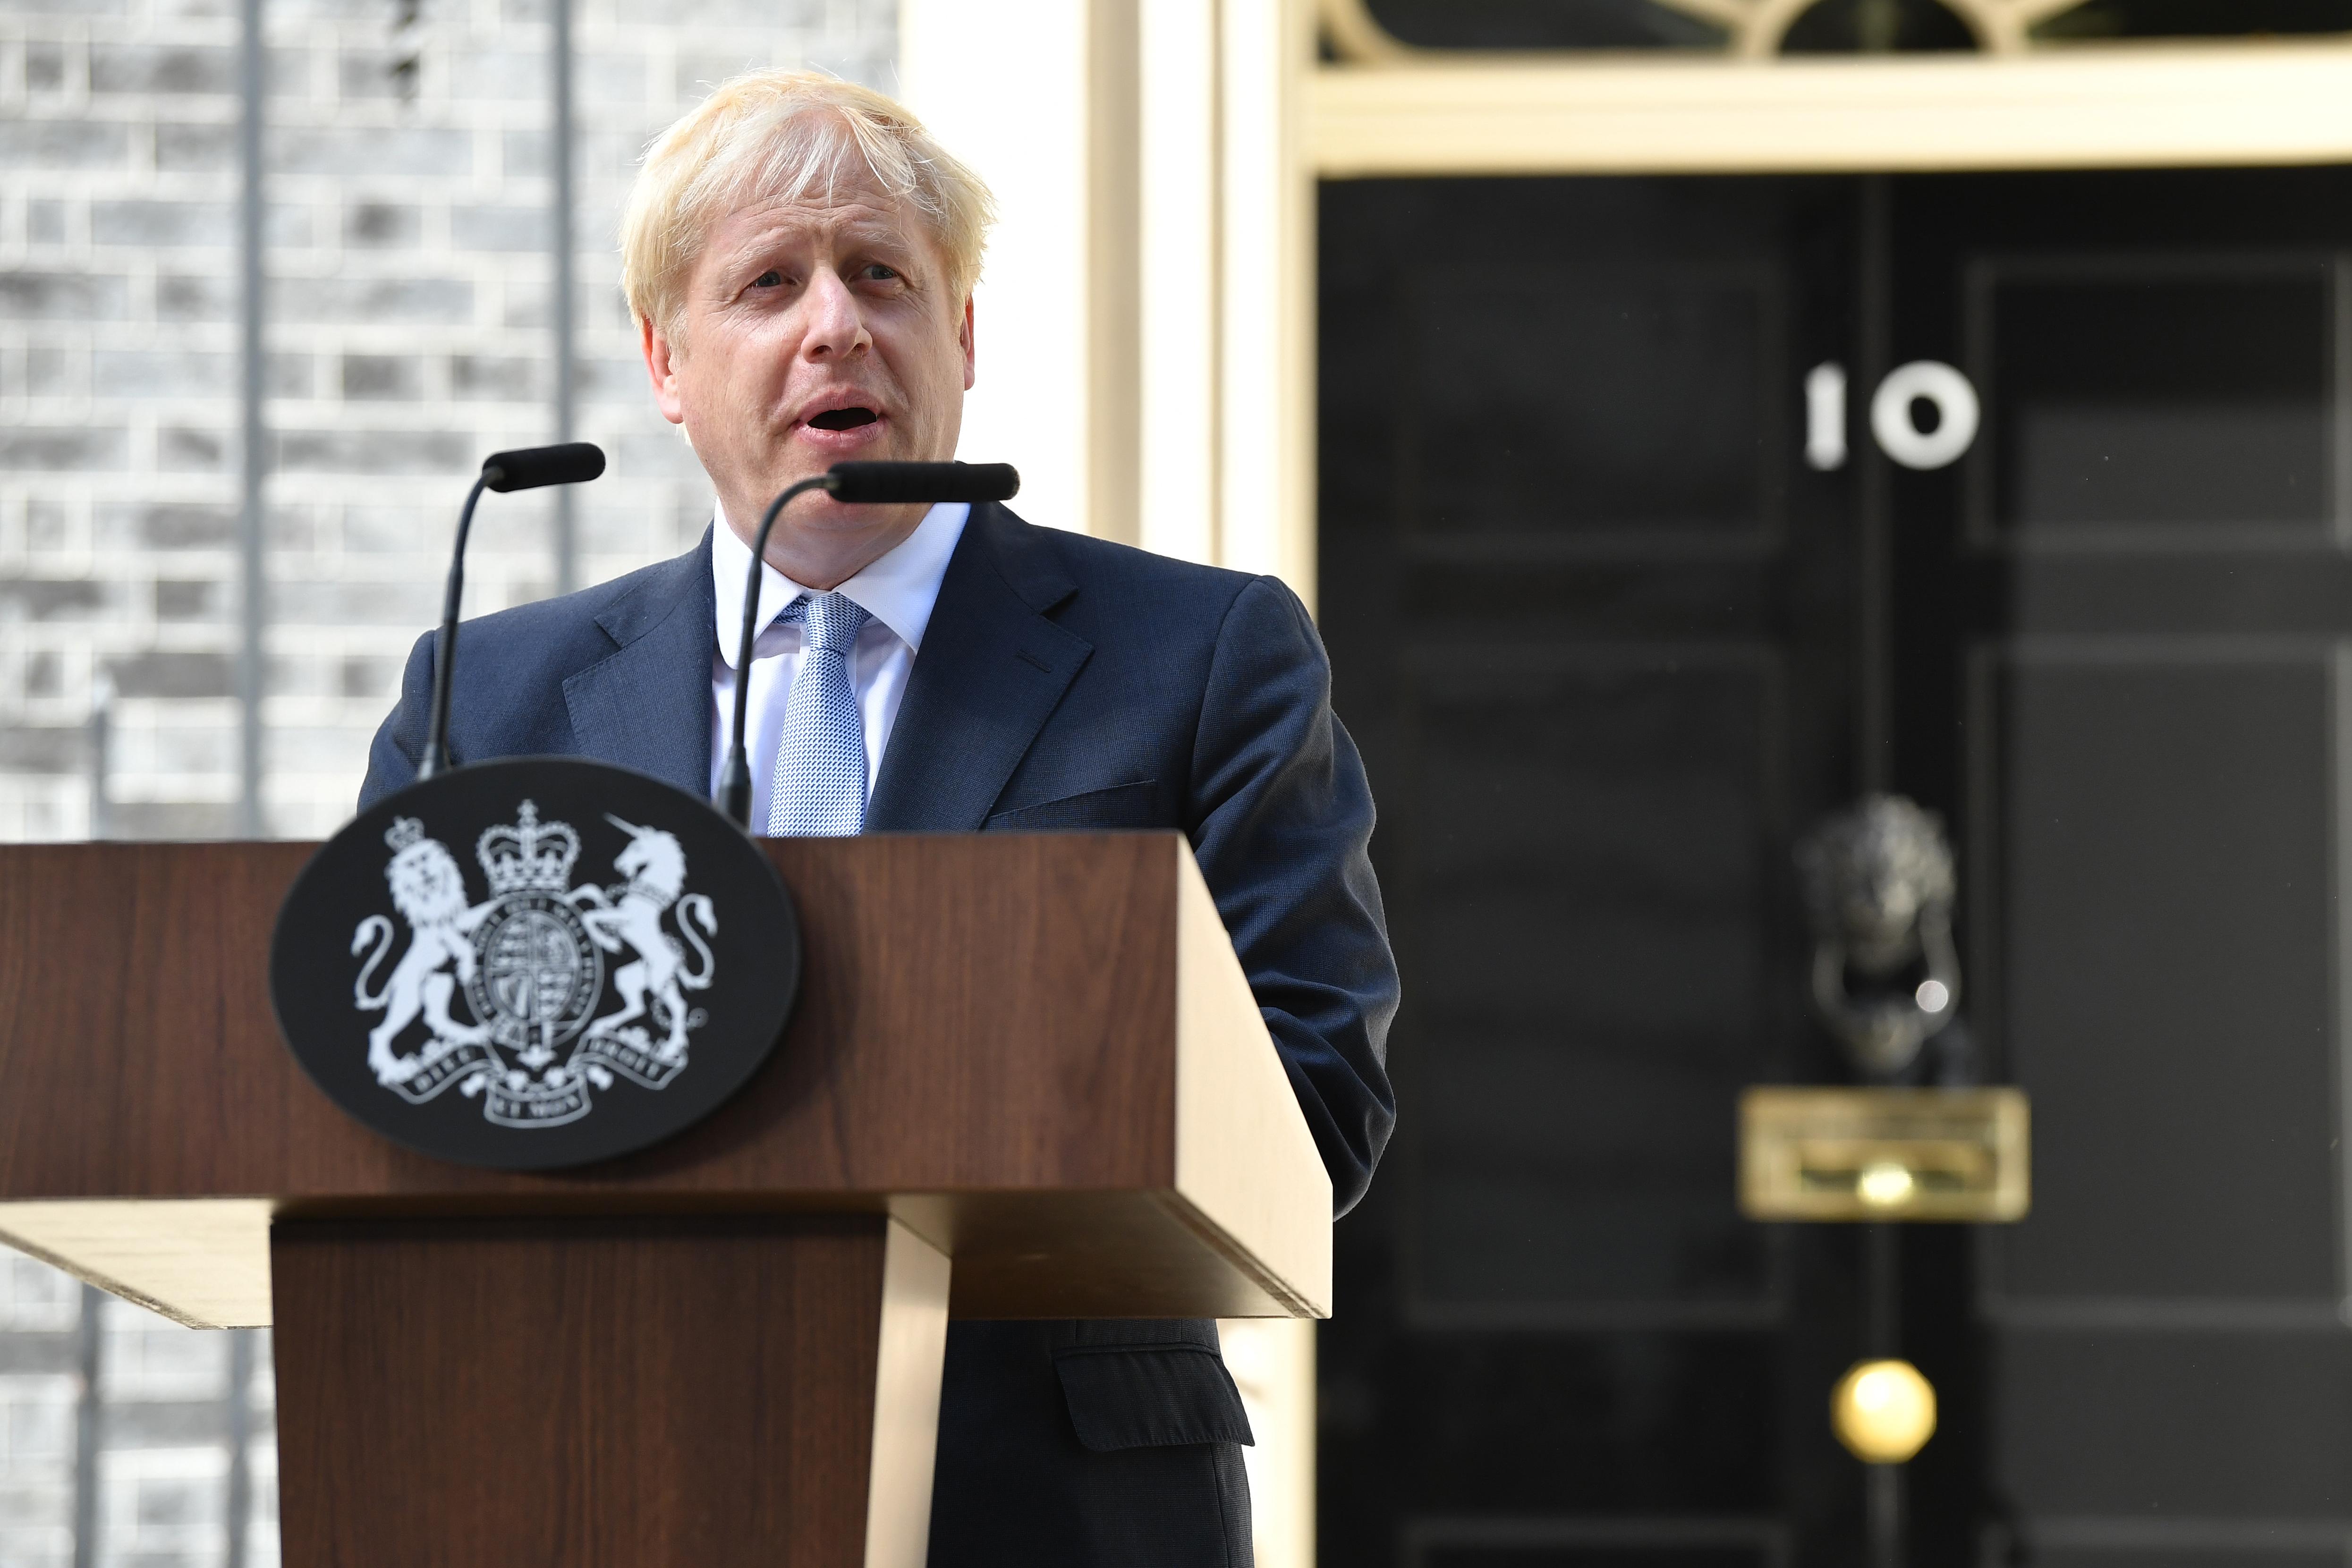 Prime Minister Boris Johnson still more popular than Jeremy Corbyn, says public